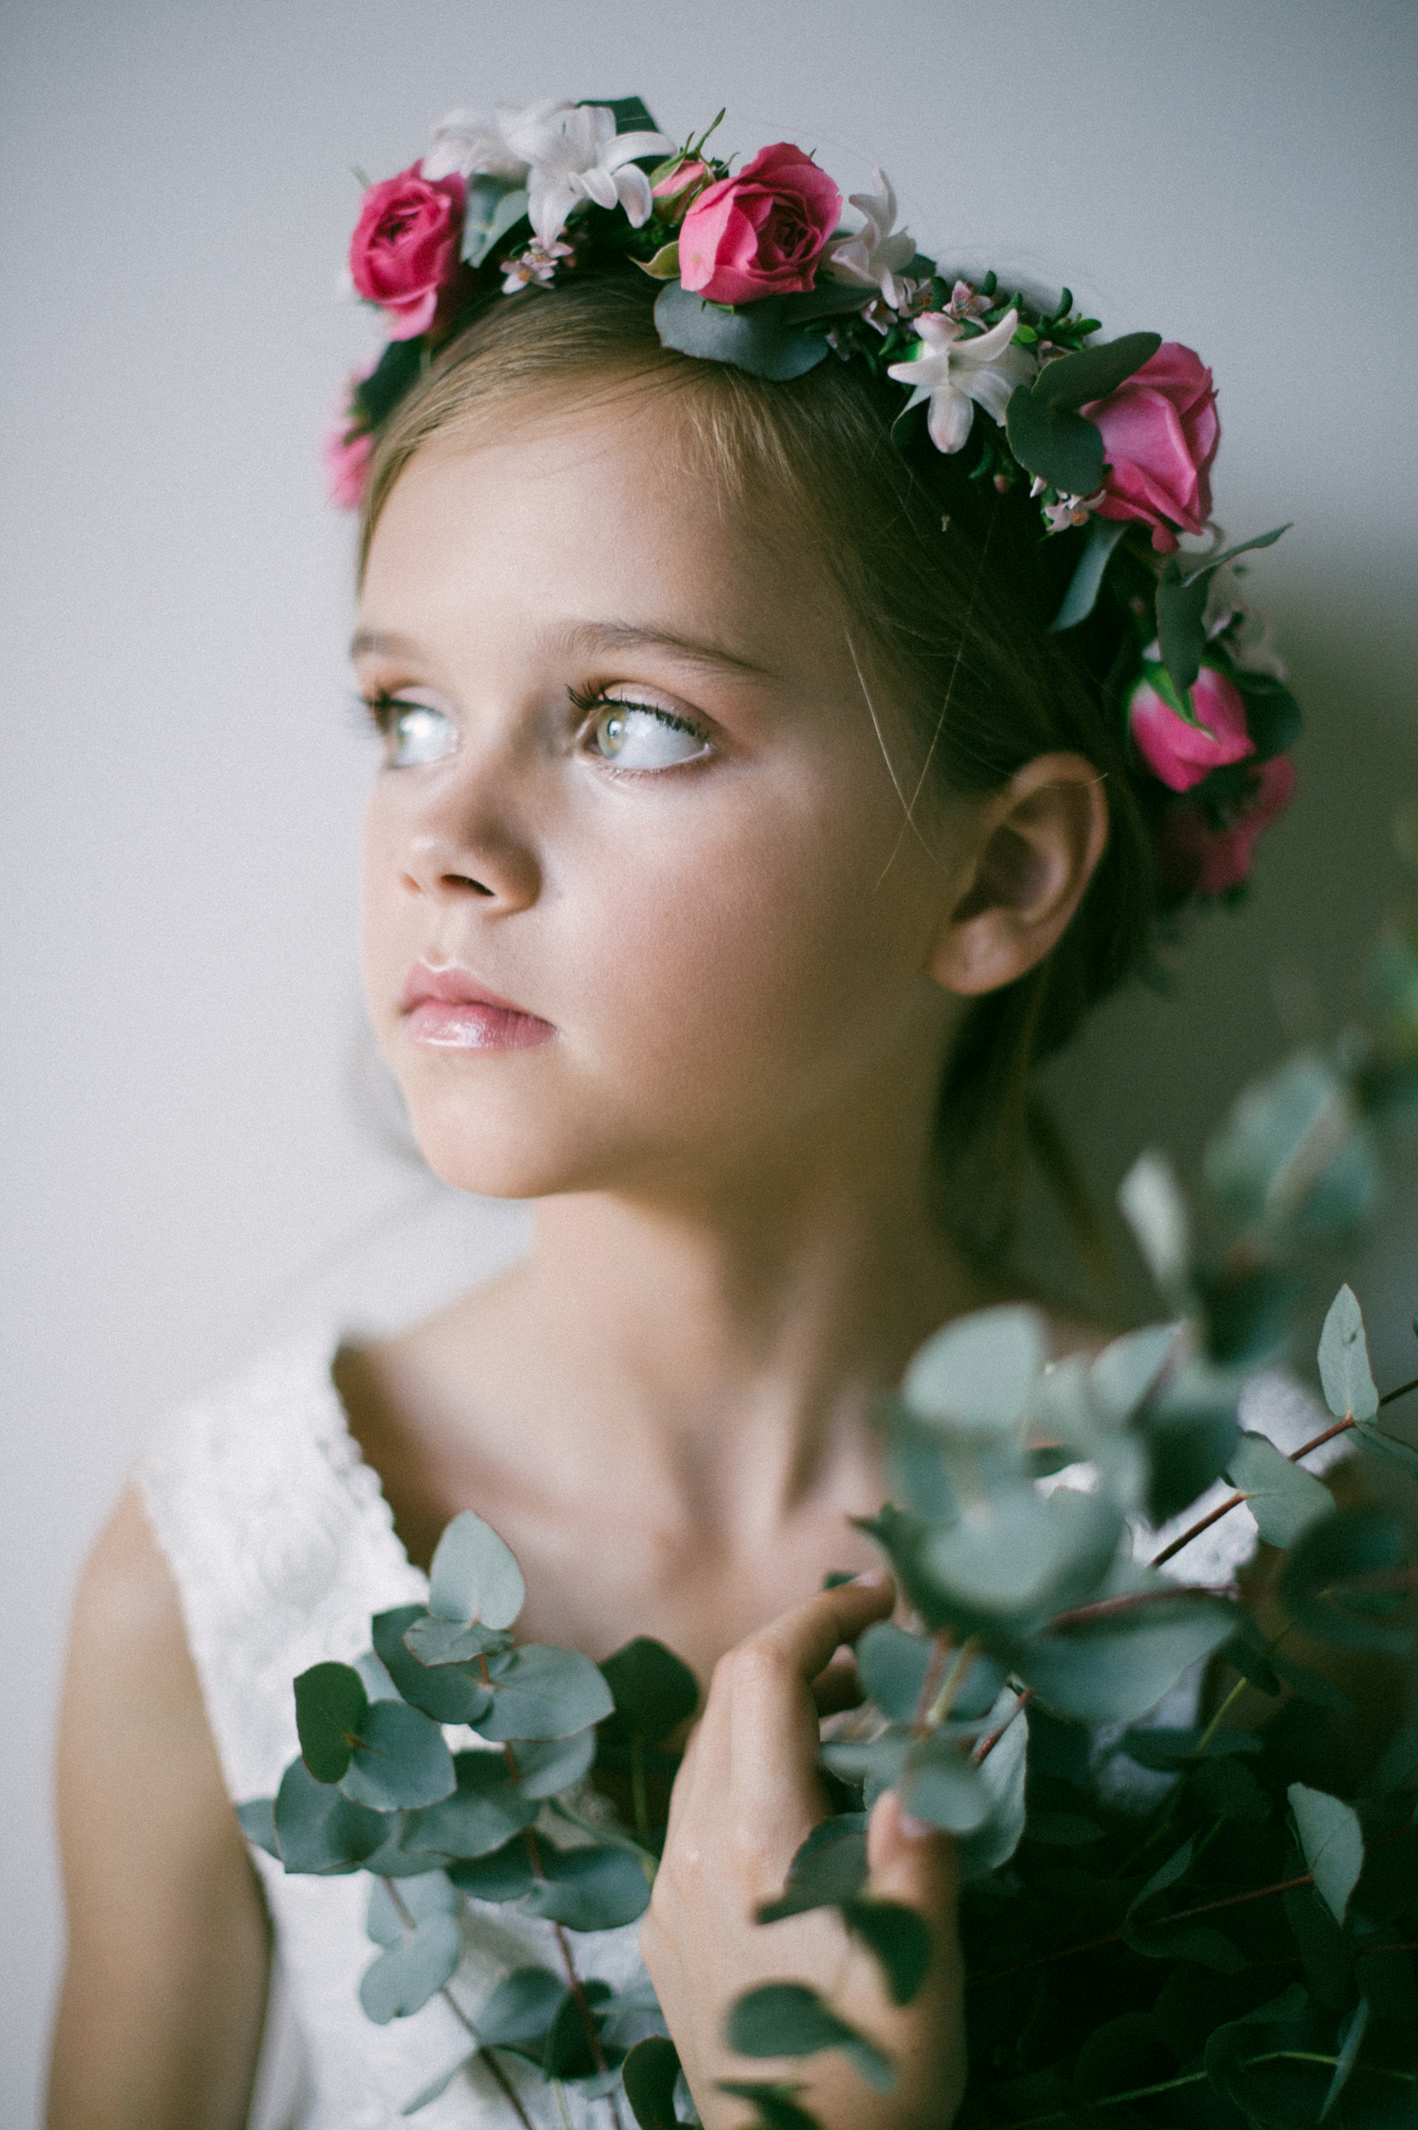 013-crown-of-eden-sophie-baker-photography